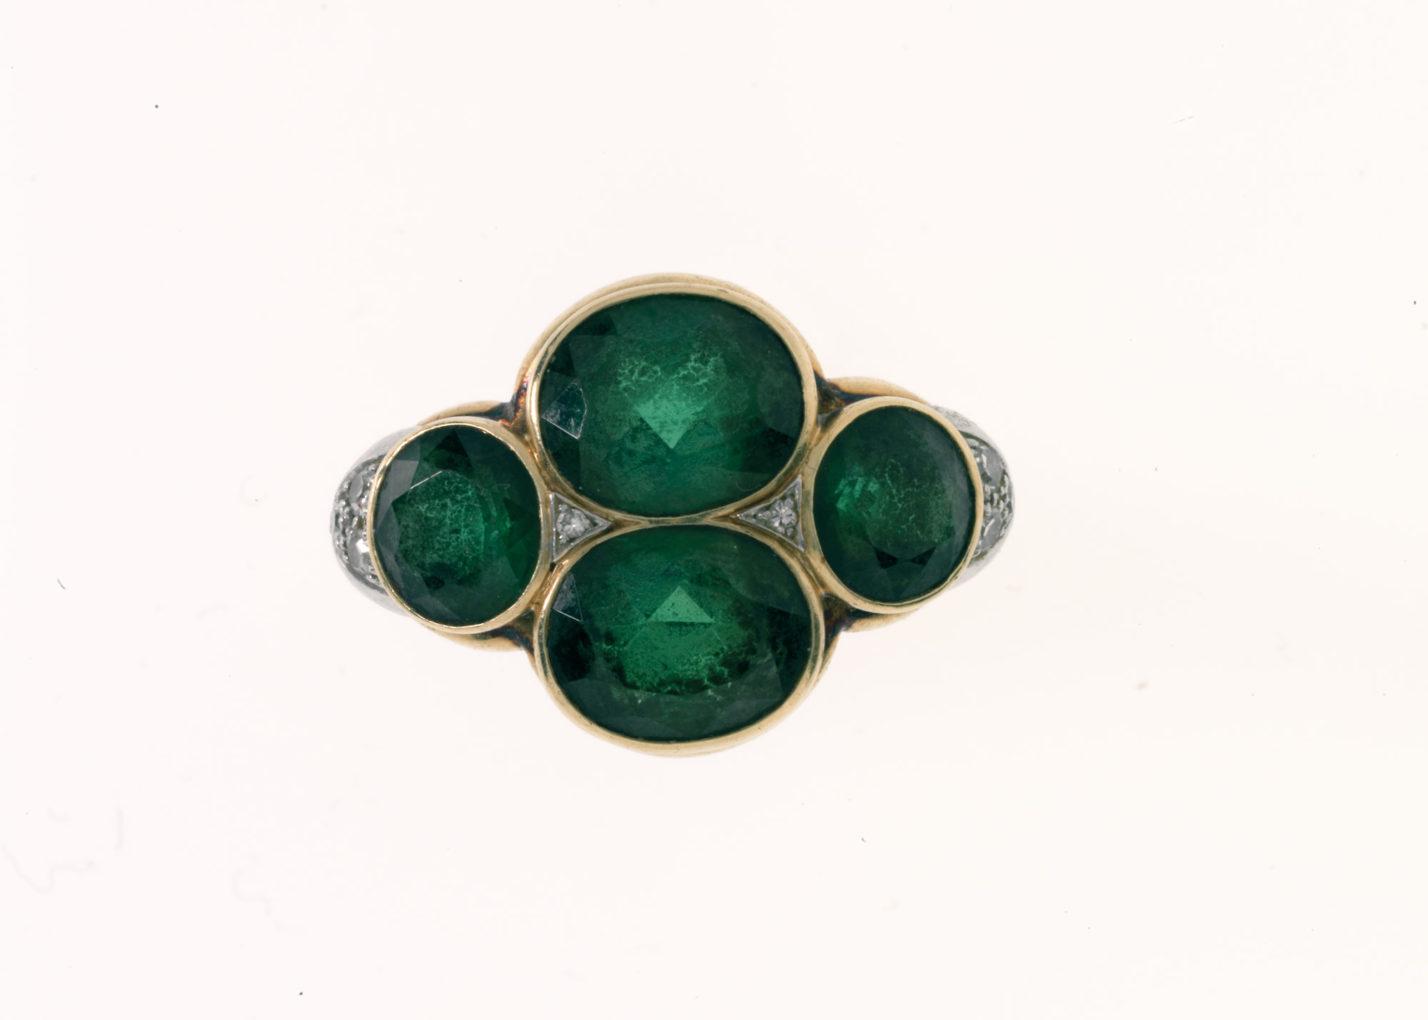 5-17_Jewellery_Landesmuseum_Guebelin_03-5---DIG-39907_LM-873011